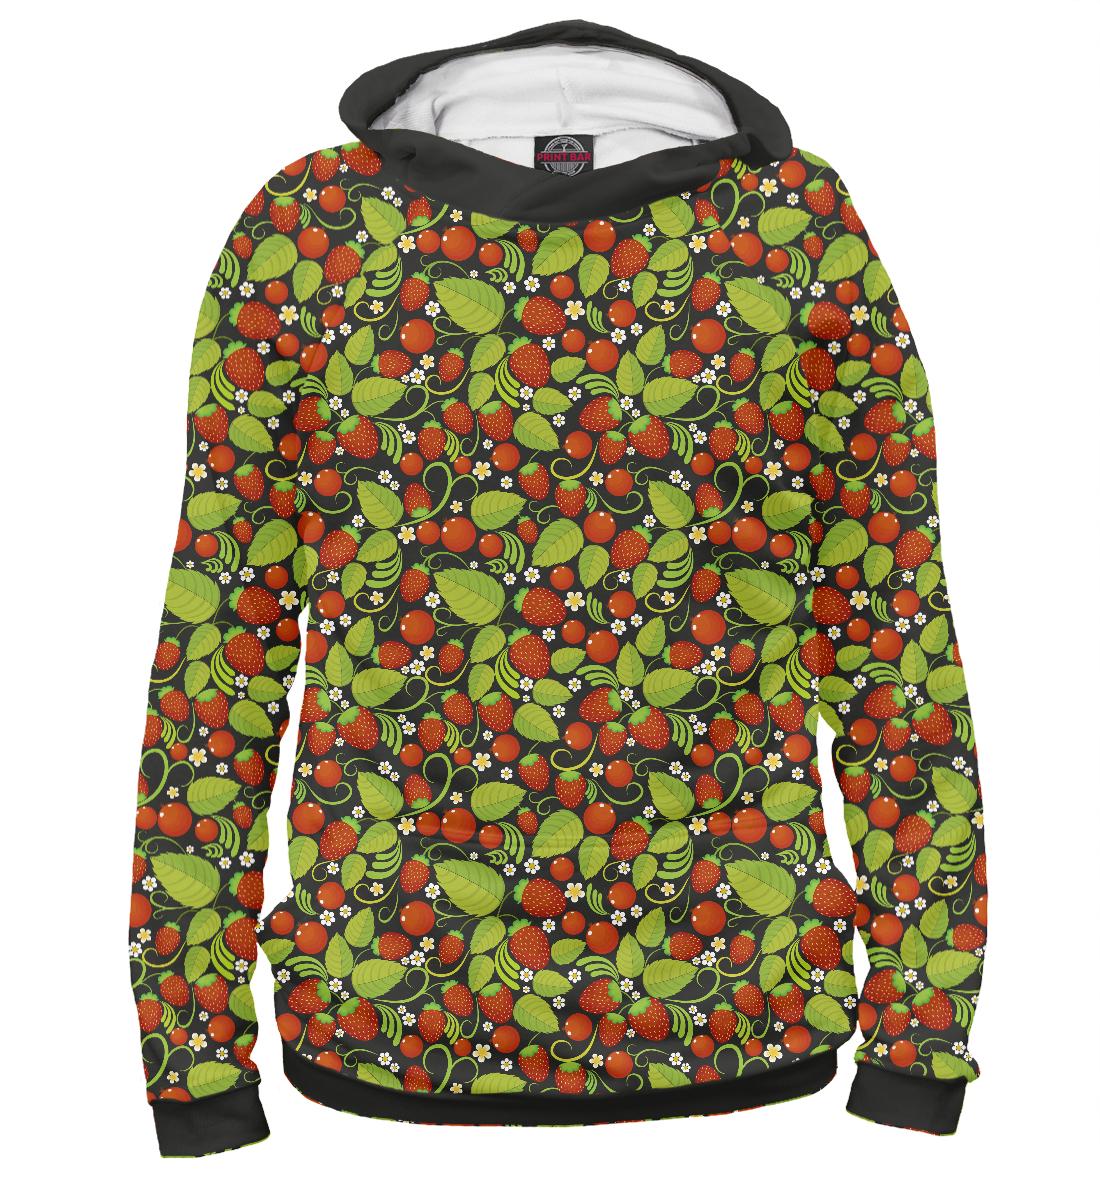 Купить Хохлома (ягоды), Printbar, Худи, ORN-990855-hud-1